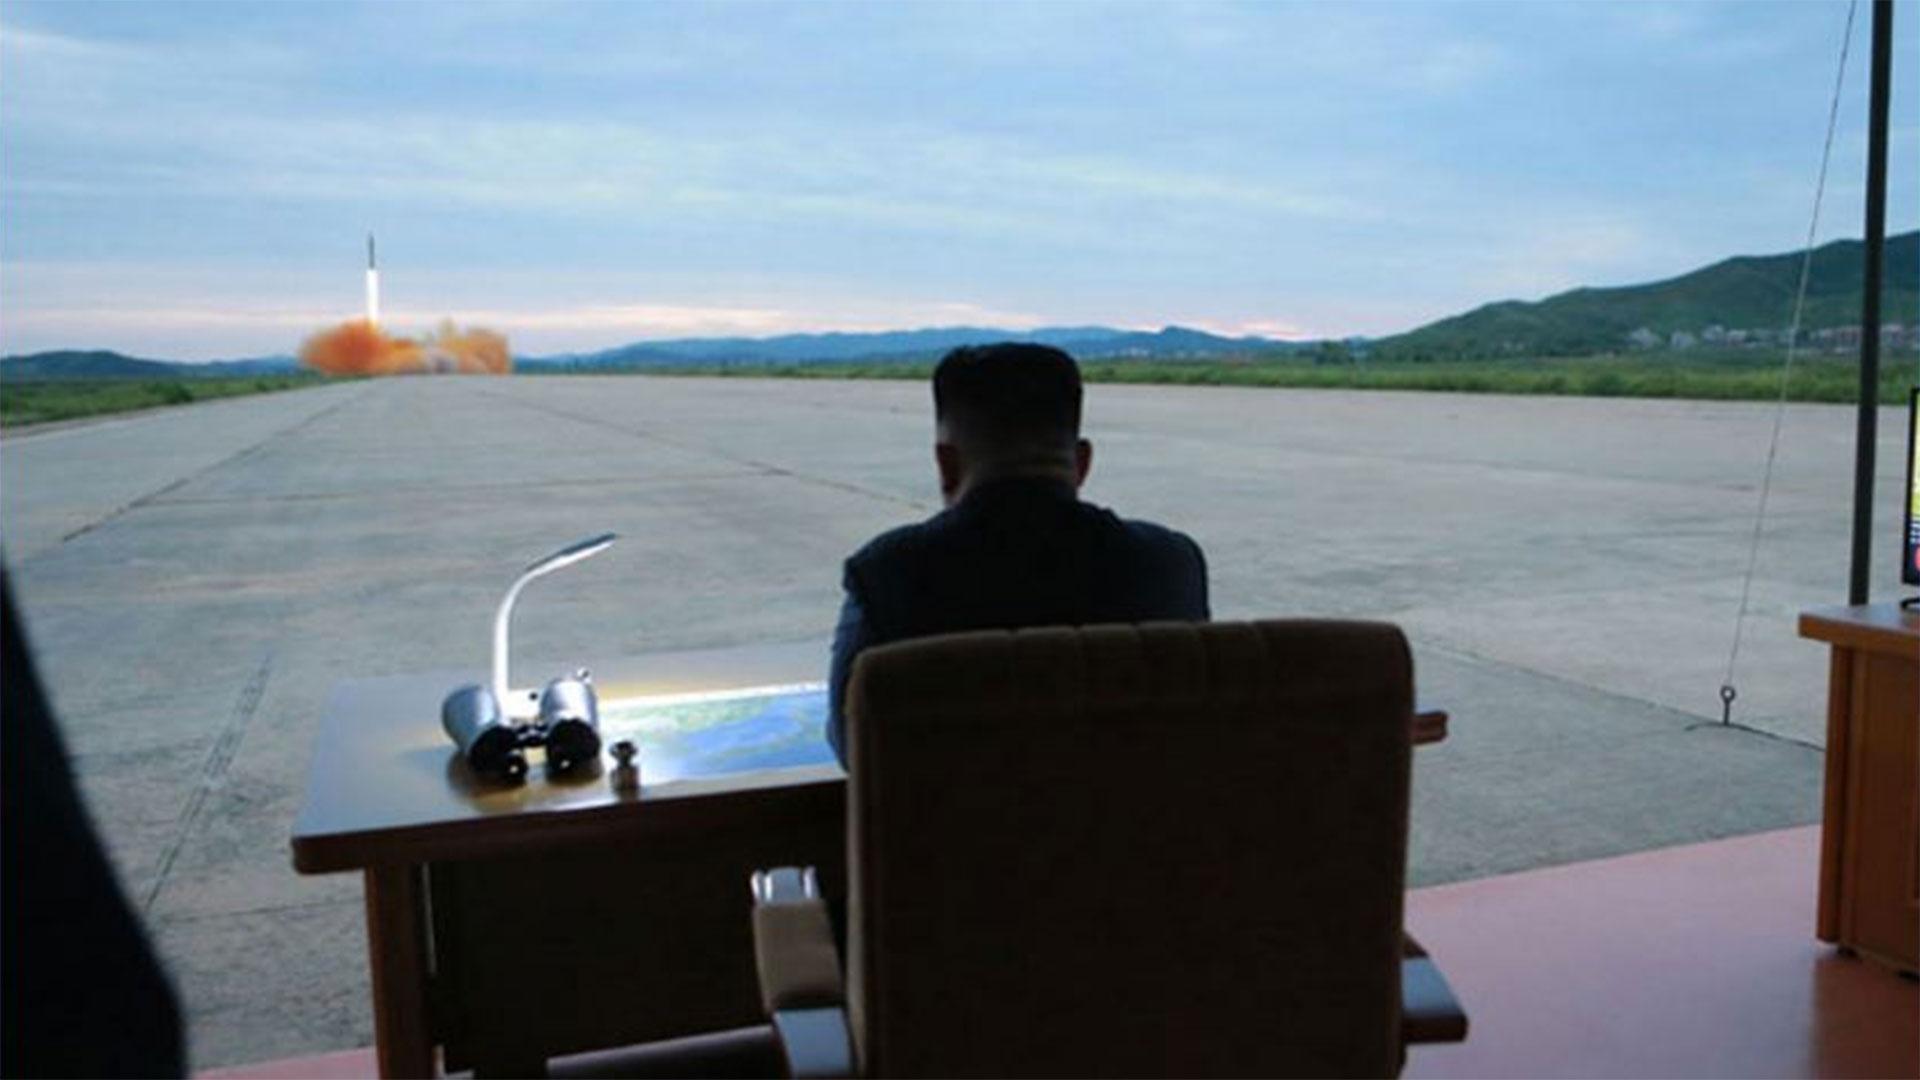 EEUU está en constante alerta ante posibles ataques nucleares del régimen de Kim Jong-un